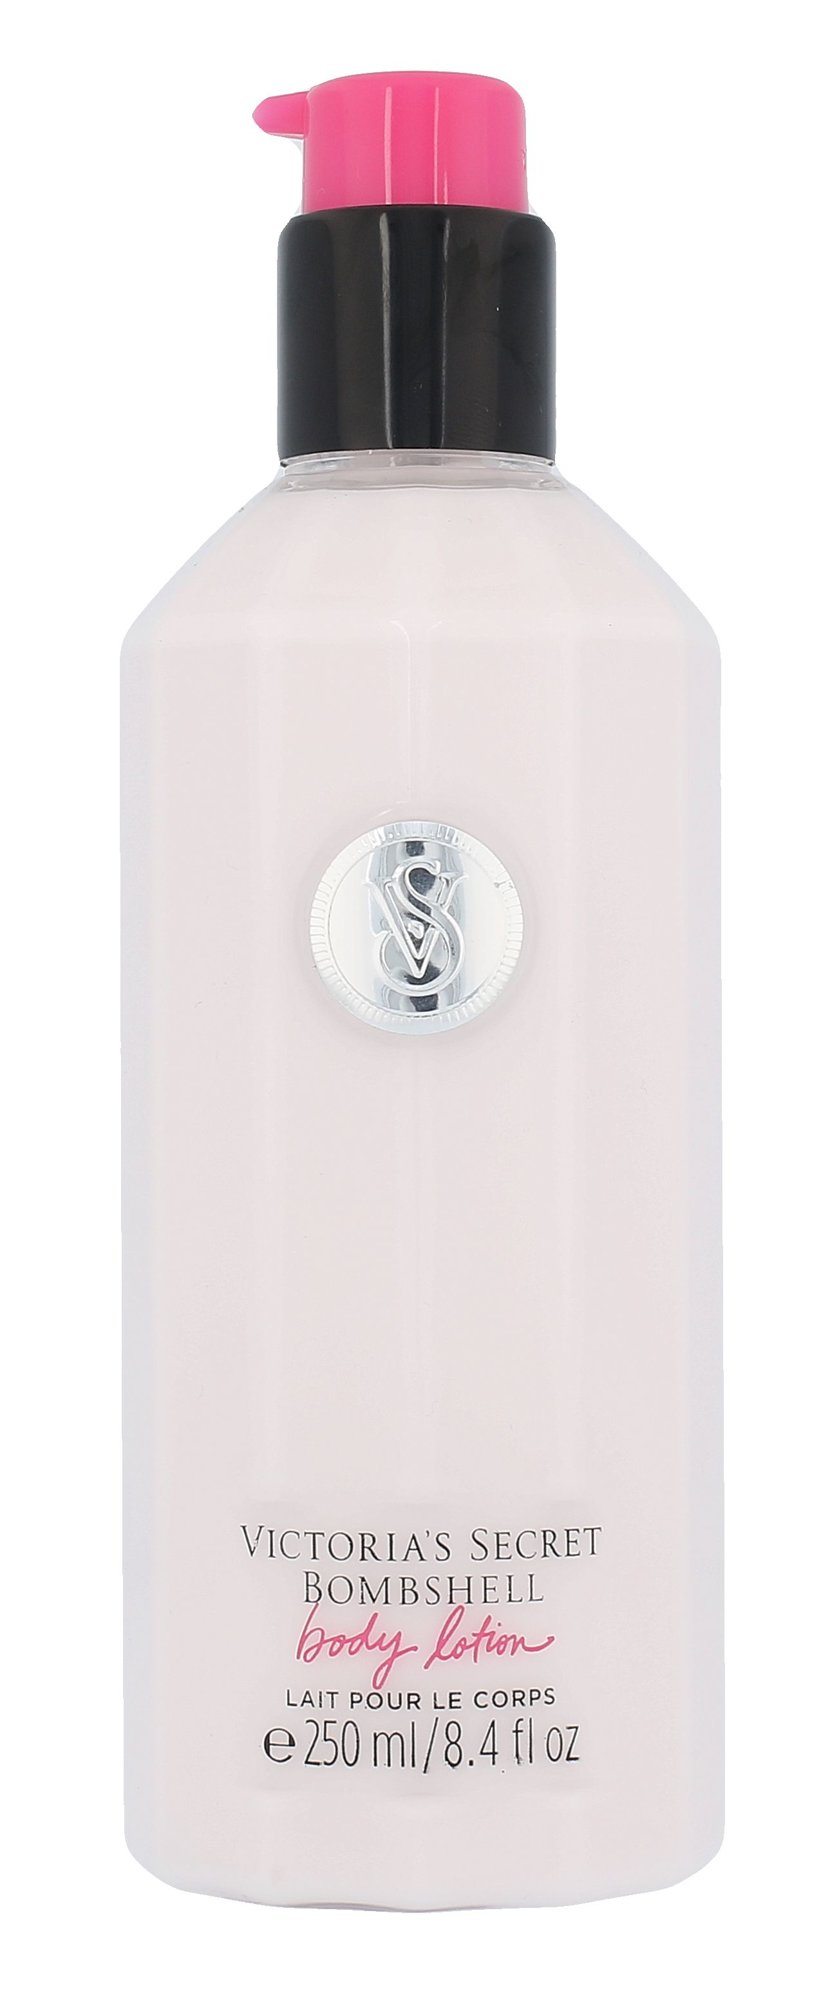 Victoria´s Secret Bombshell Body lotion 250ml